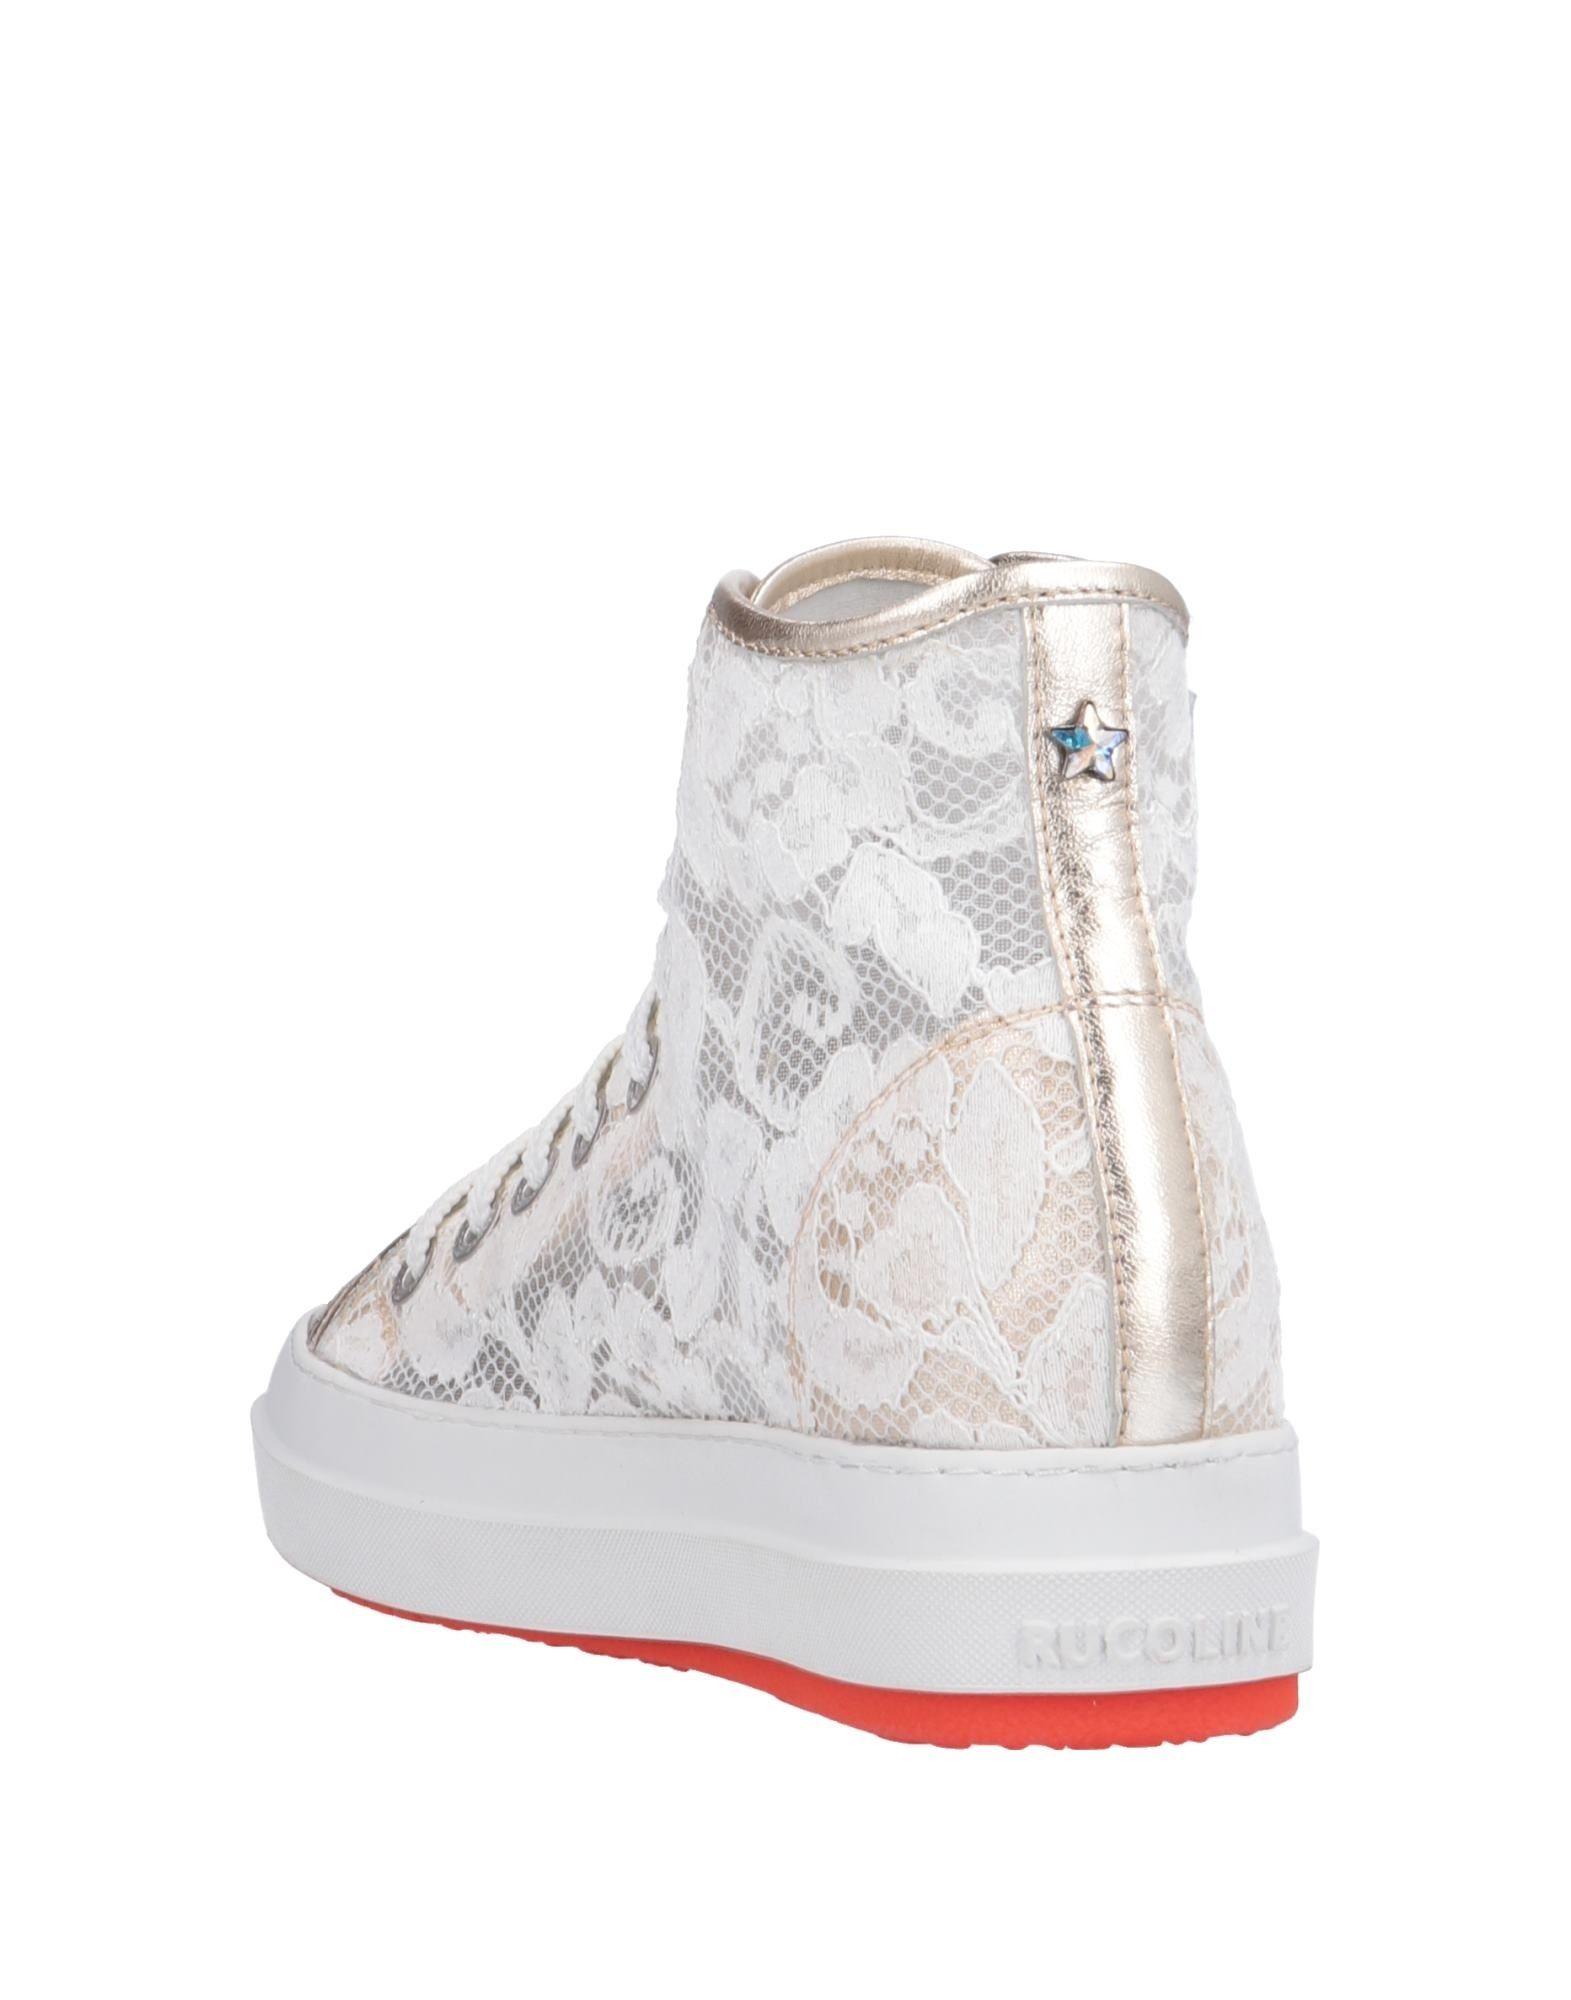 Stilvolle billige Damen Schuhe Ruco Line Sneakers Damen billige  11559608NR 0bbd92